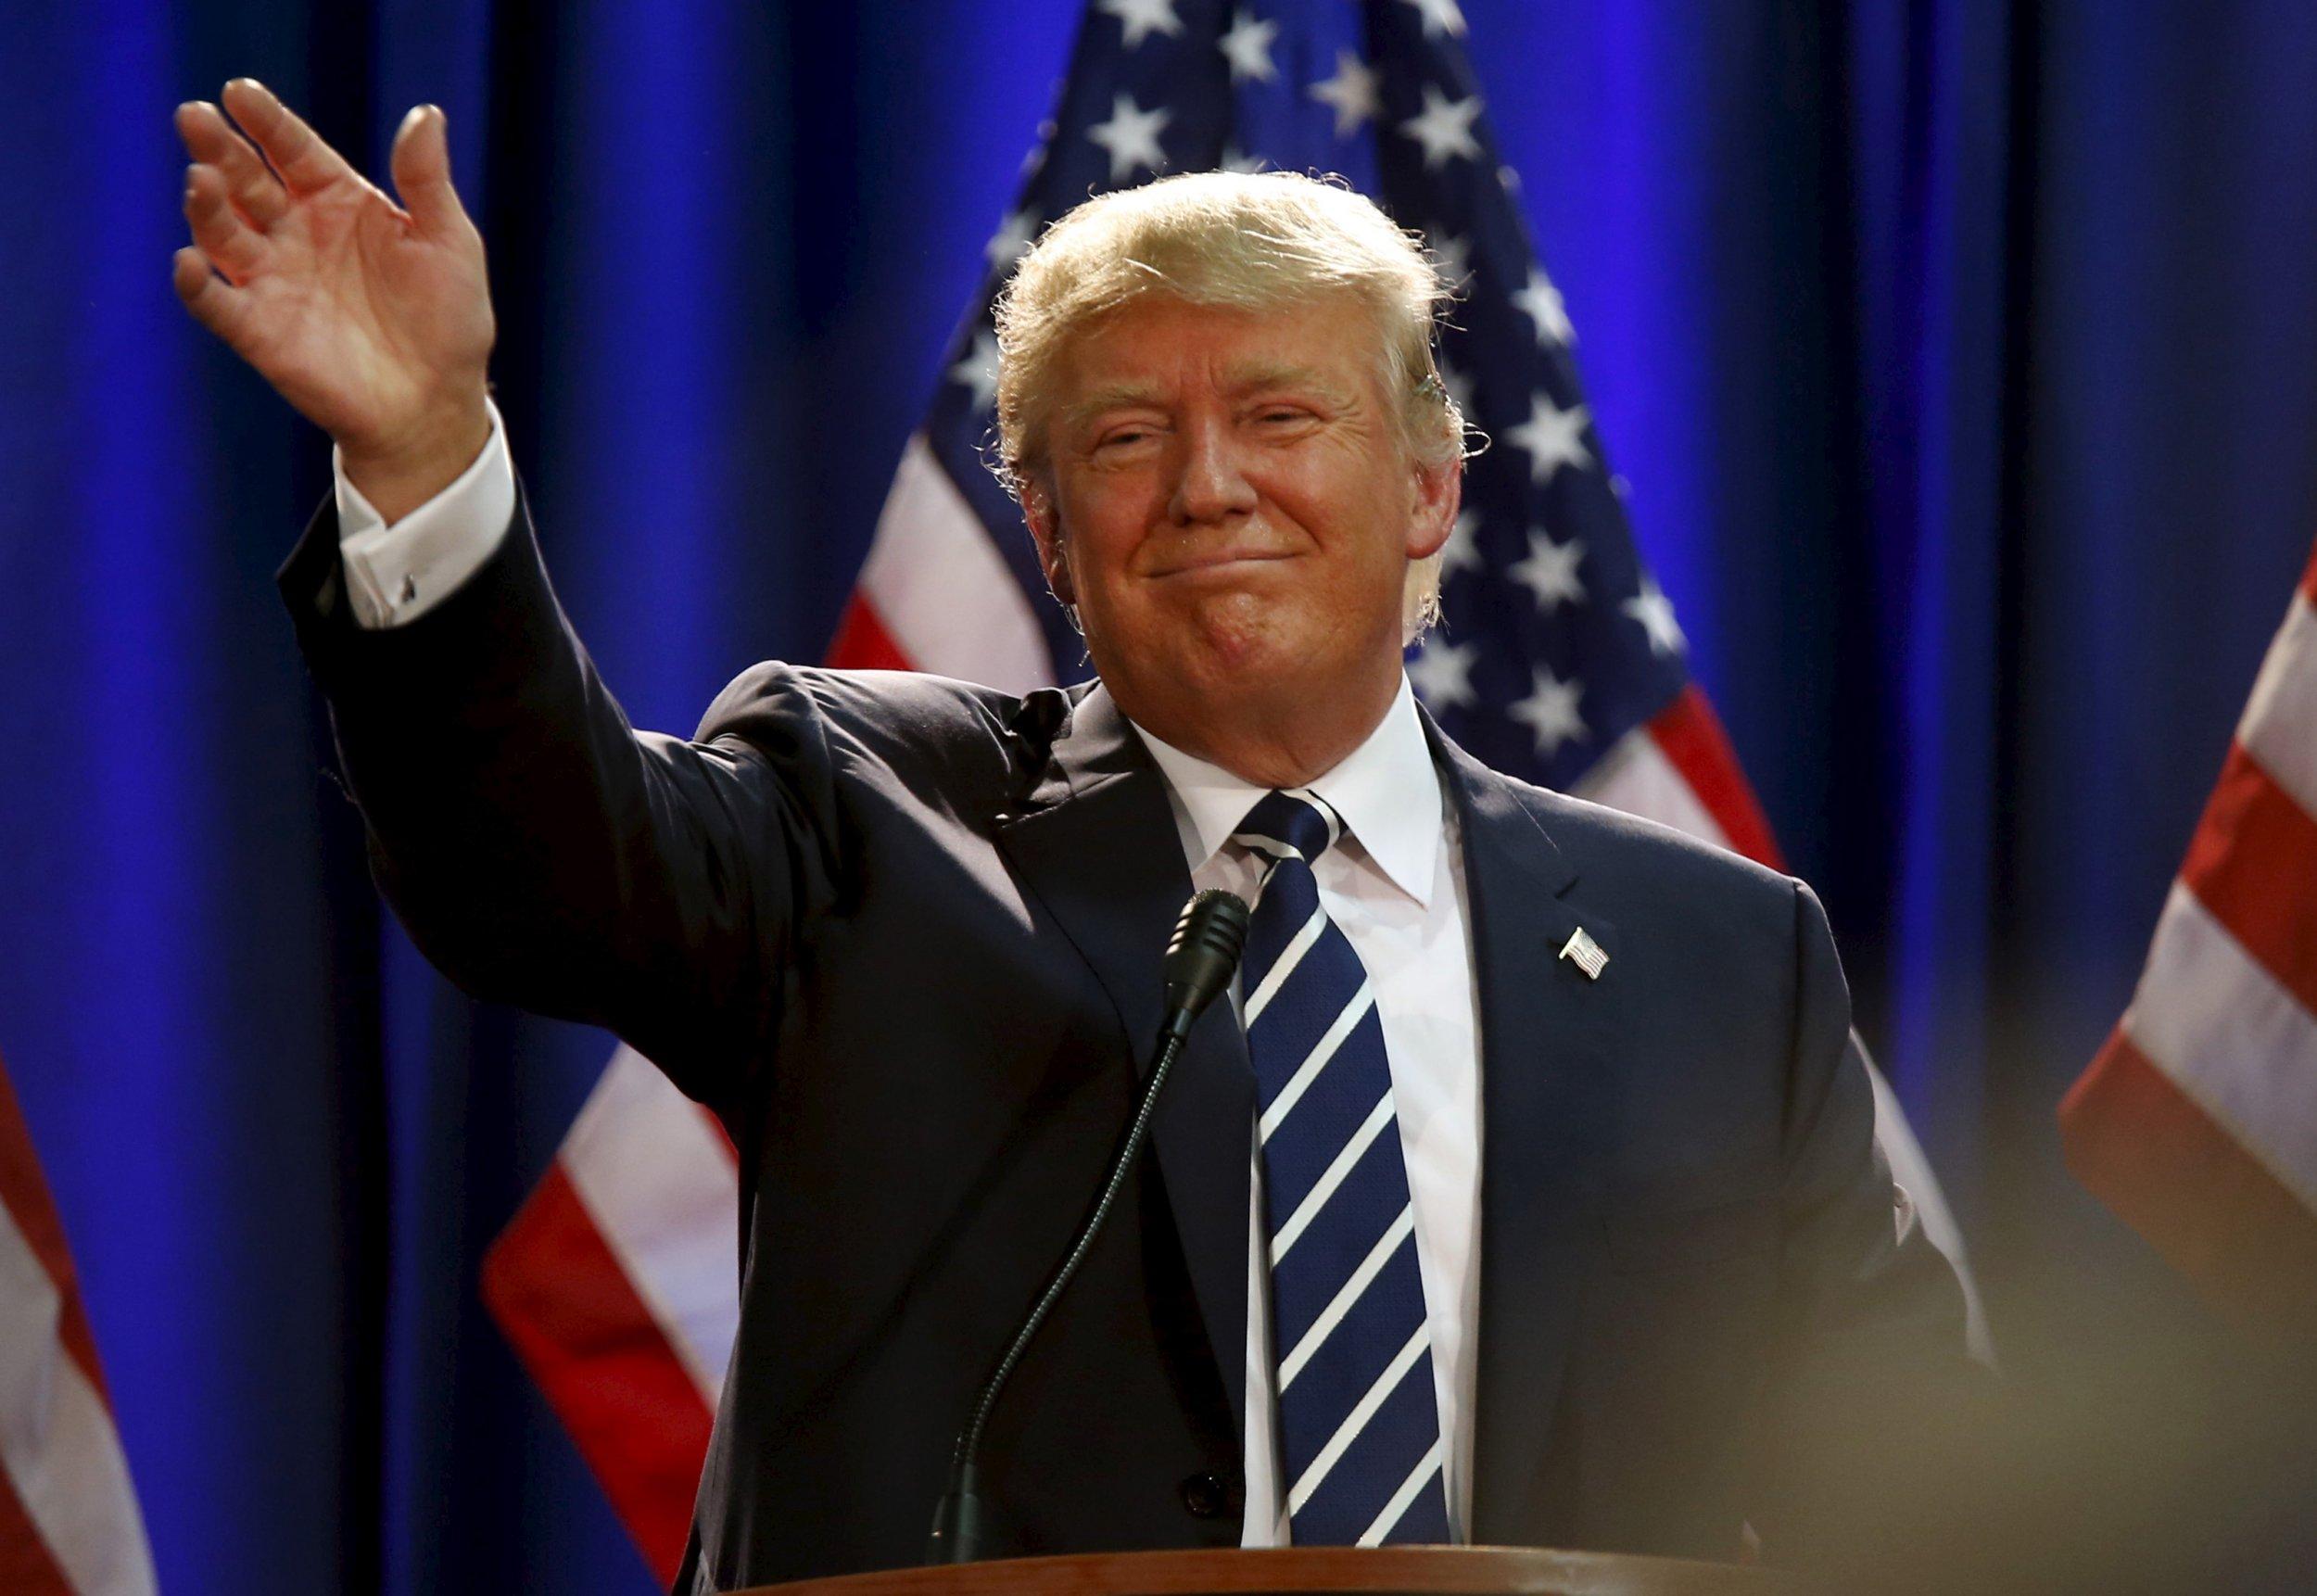 Donald Trump Arrives for NYC Jury Duty